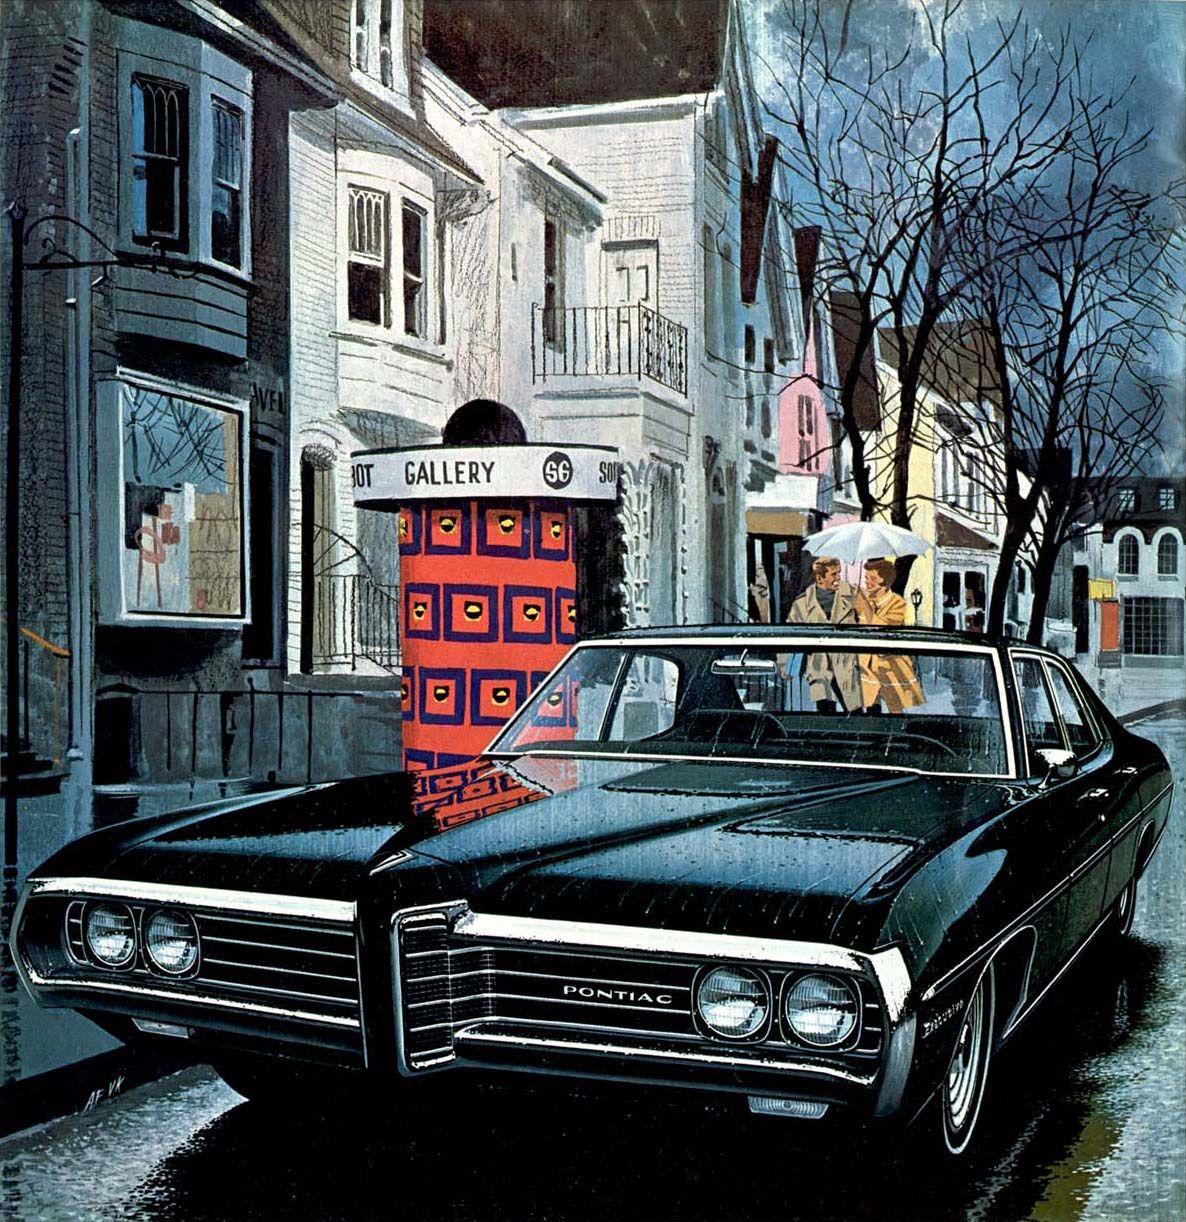 1969 Pontiac Executive 4-Door Sedan - \'Toronto\': Art Fitzpatrick ...